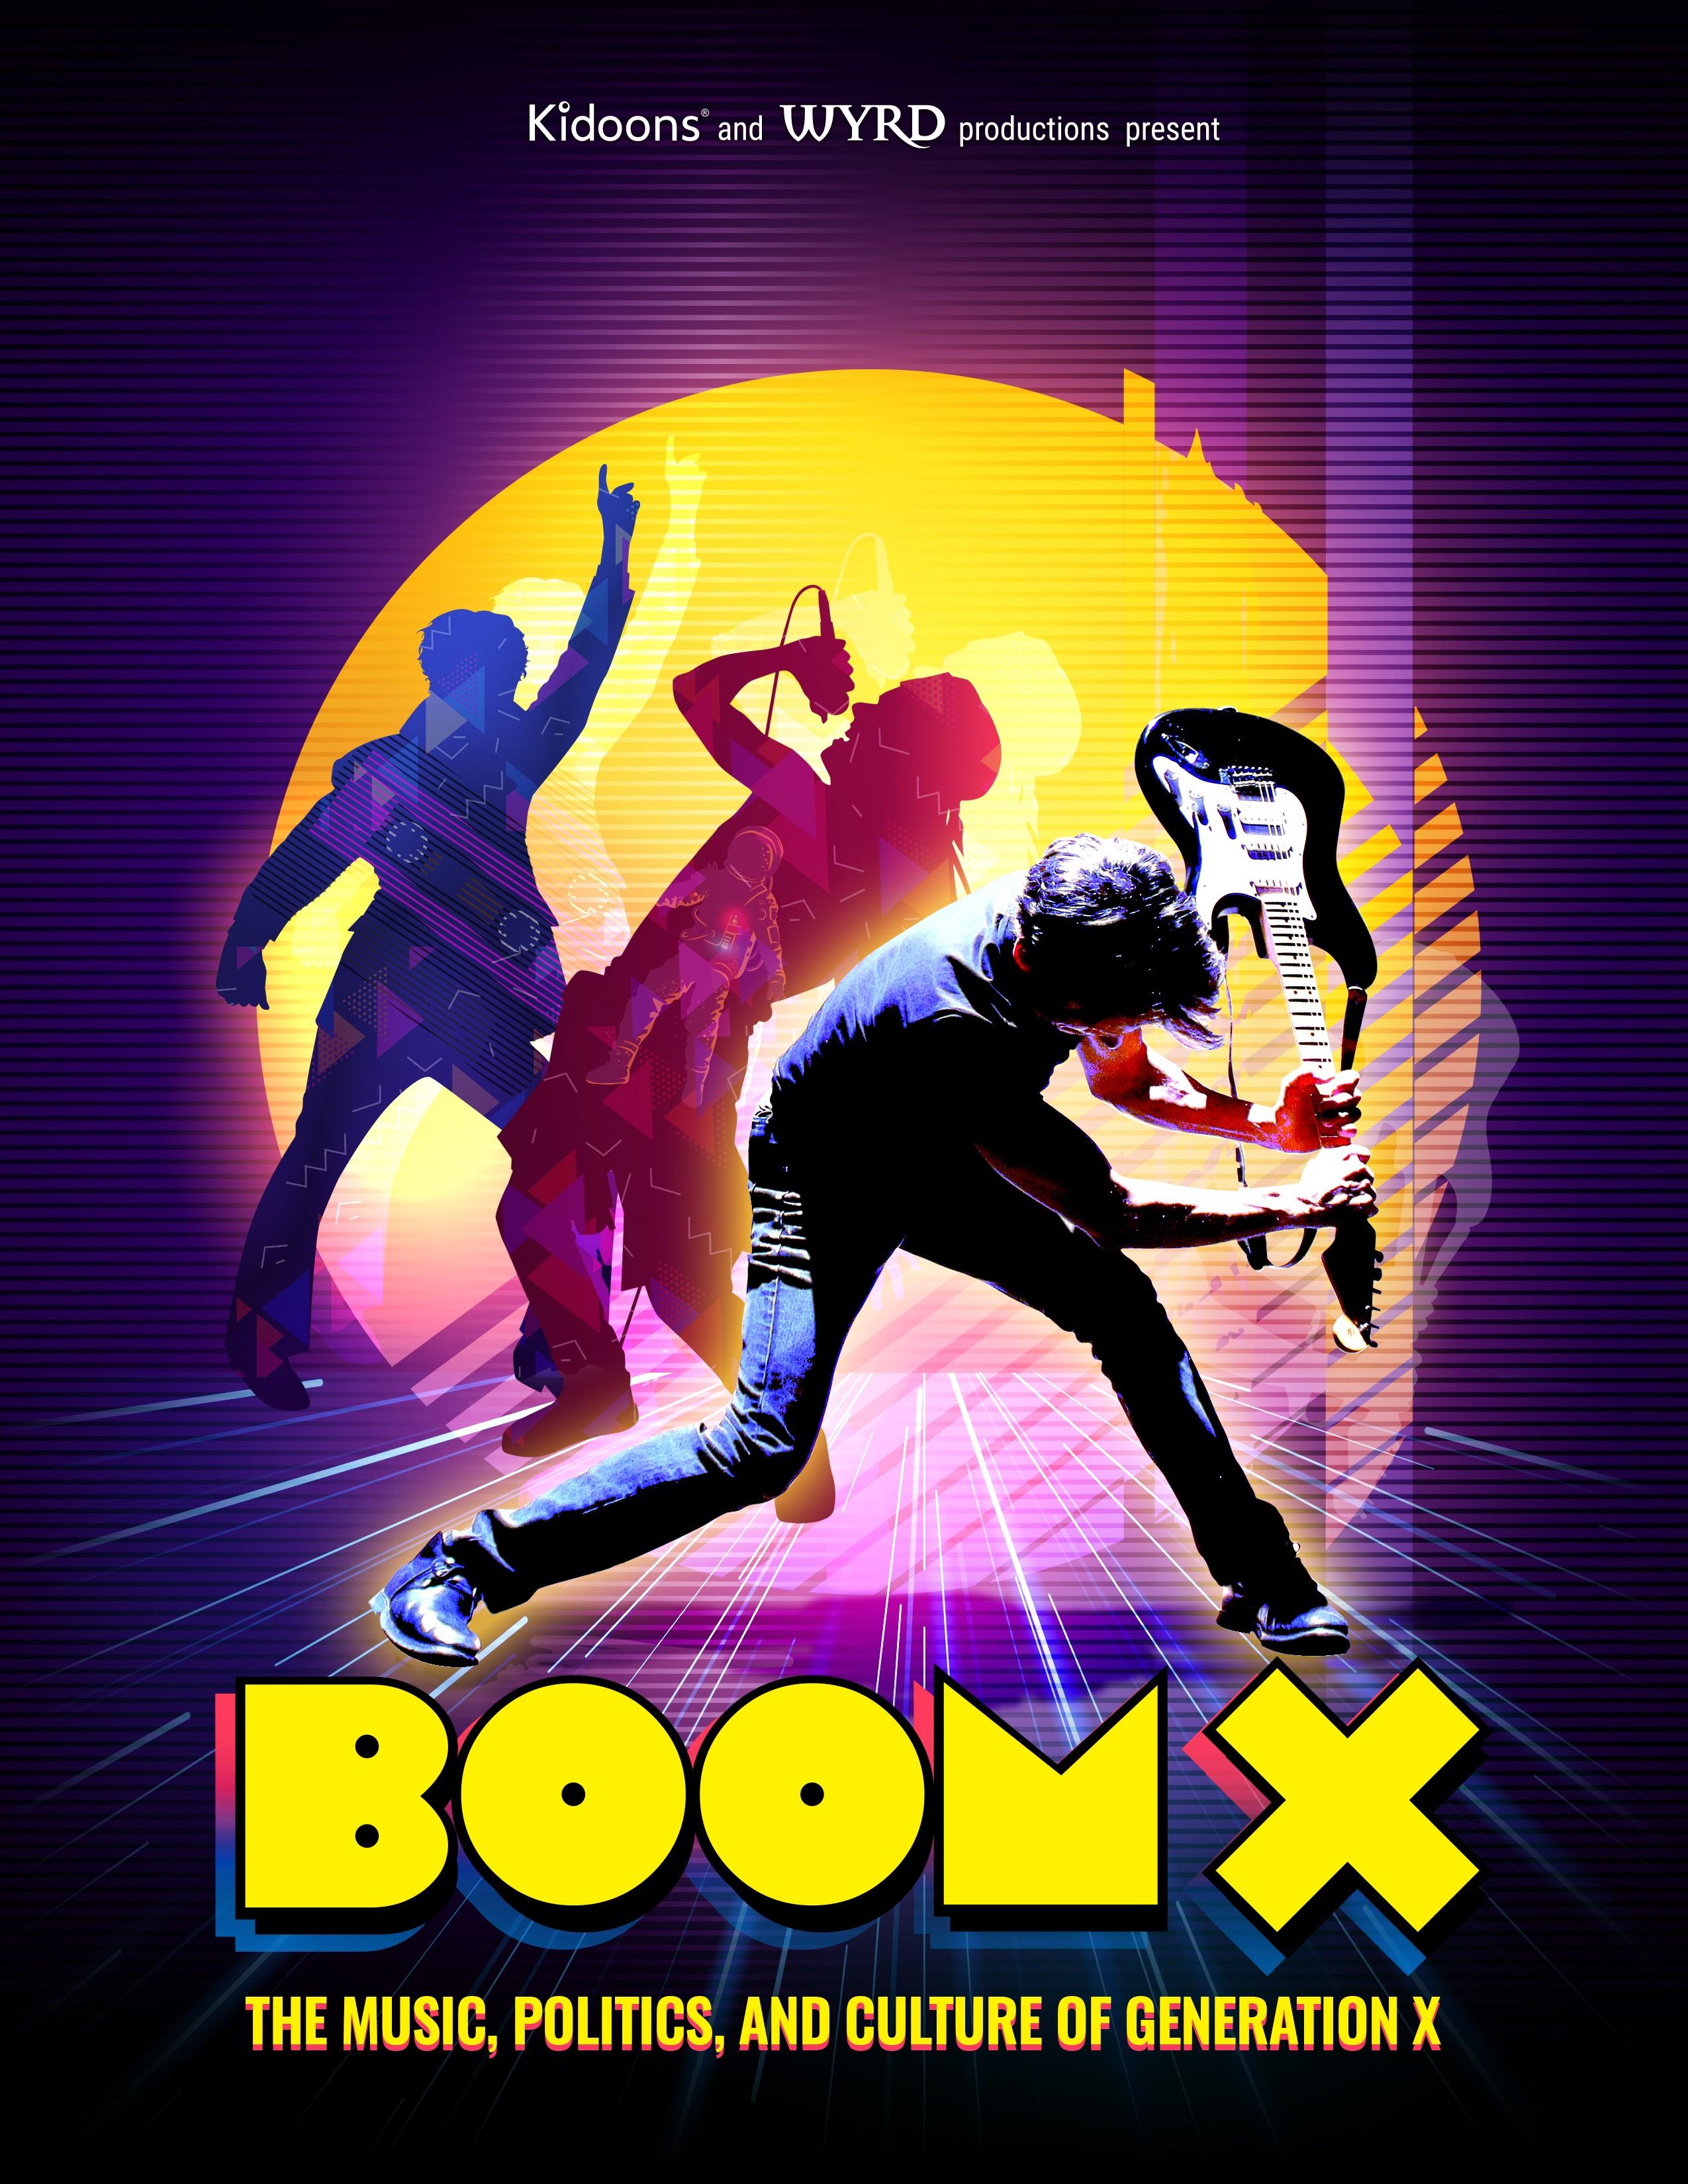 boomx-key-image-A_190315b.jpg